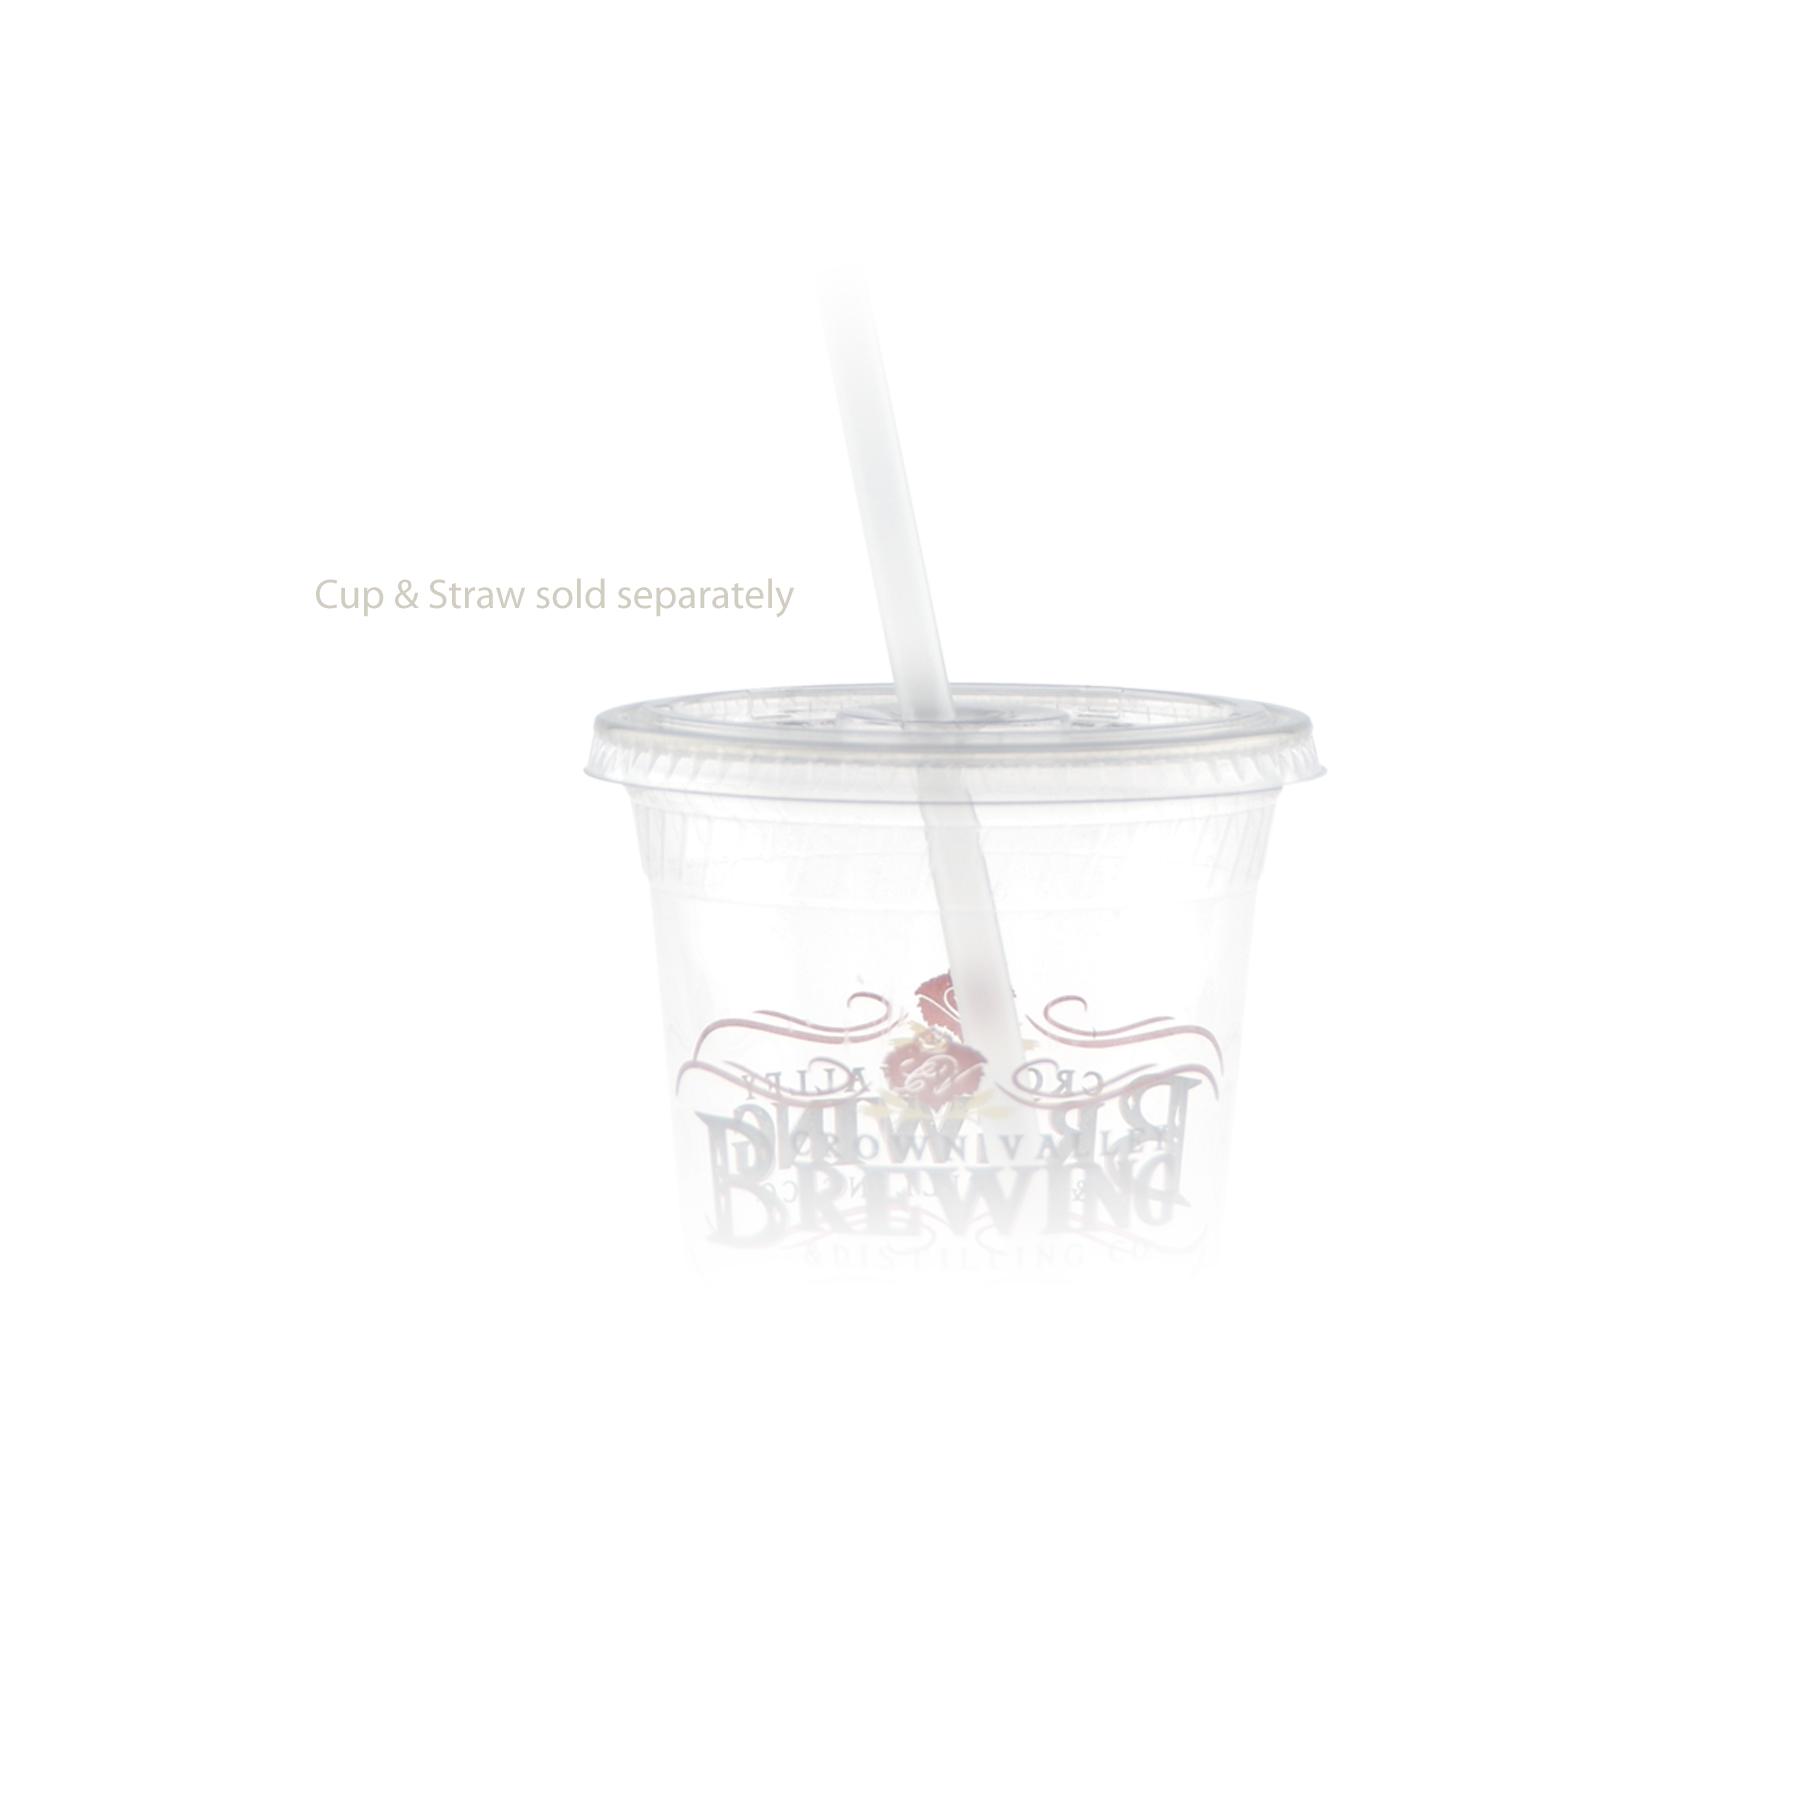 16/24 oz Eco-Friendly Plastic Cup Straw Slot Lid